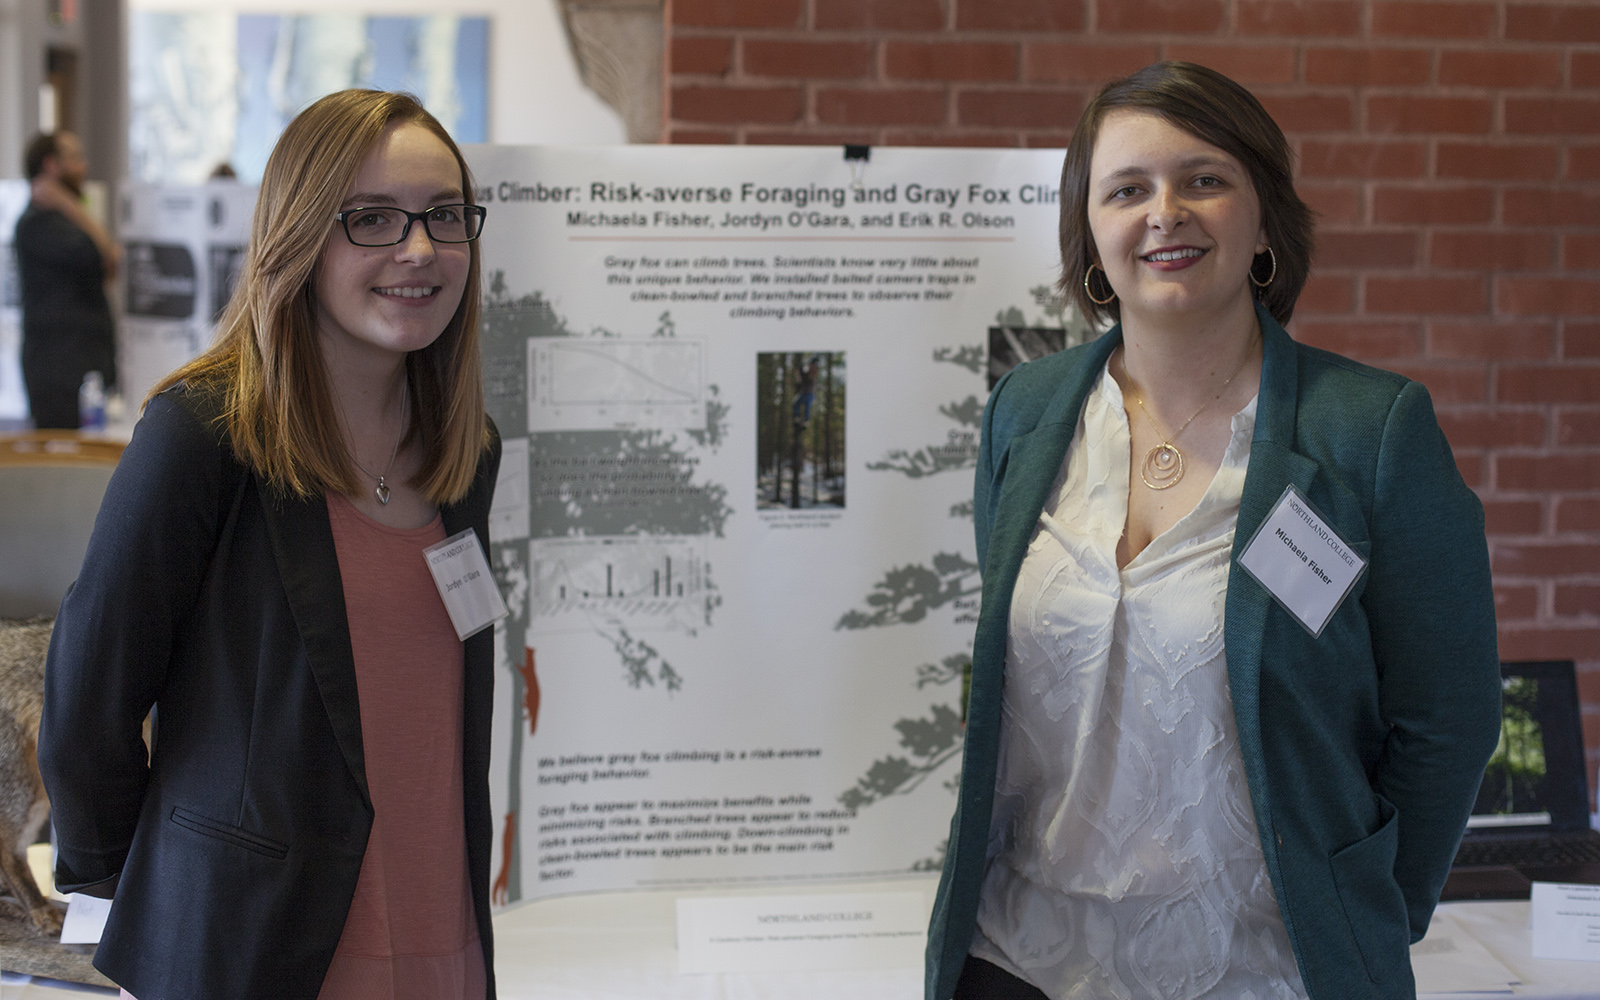 Northland College students present original research on gray fox behaviors.